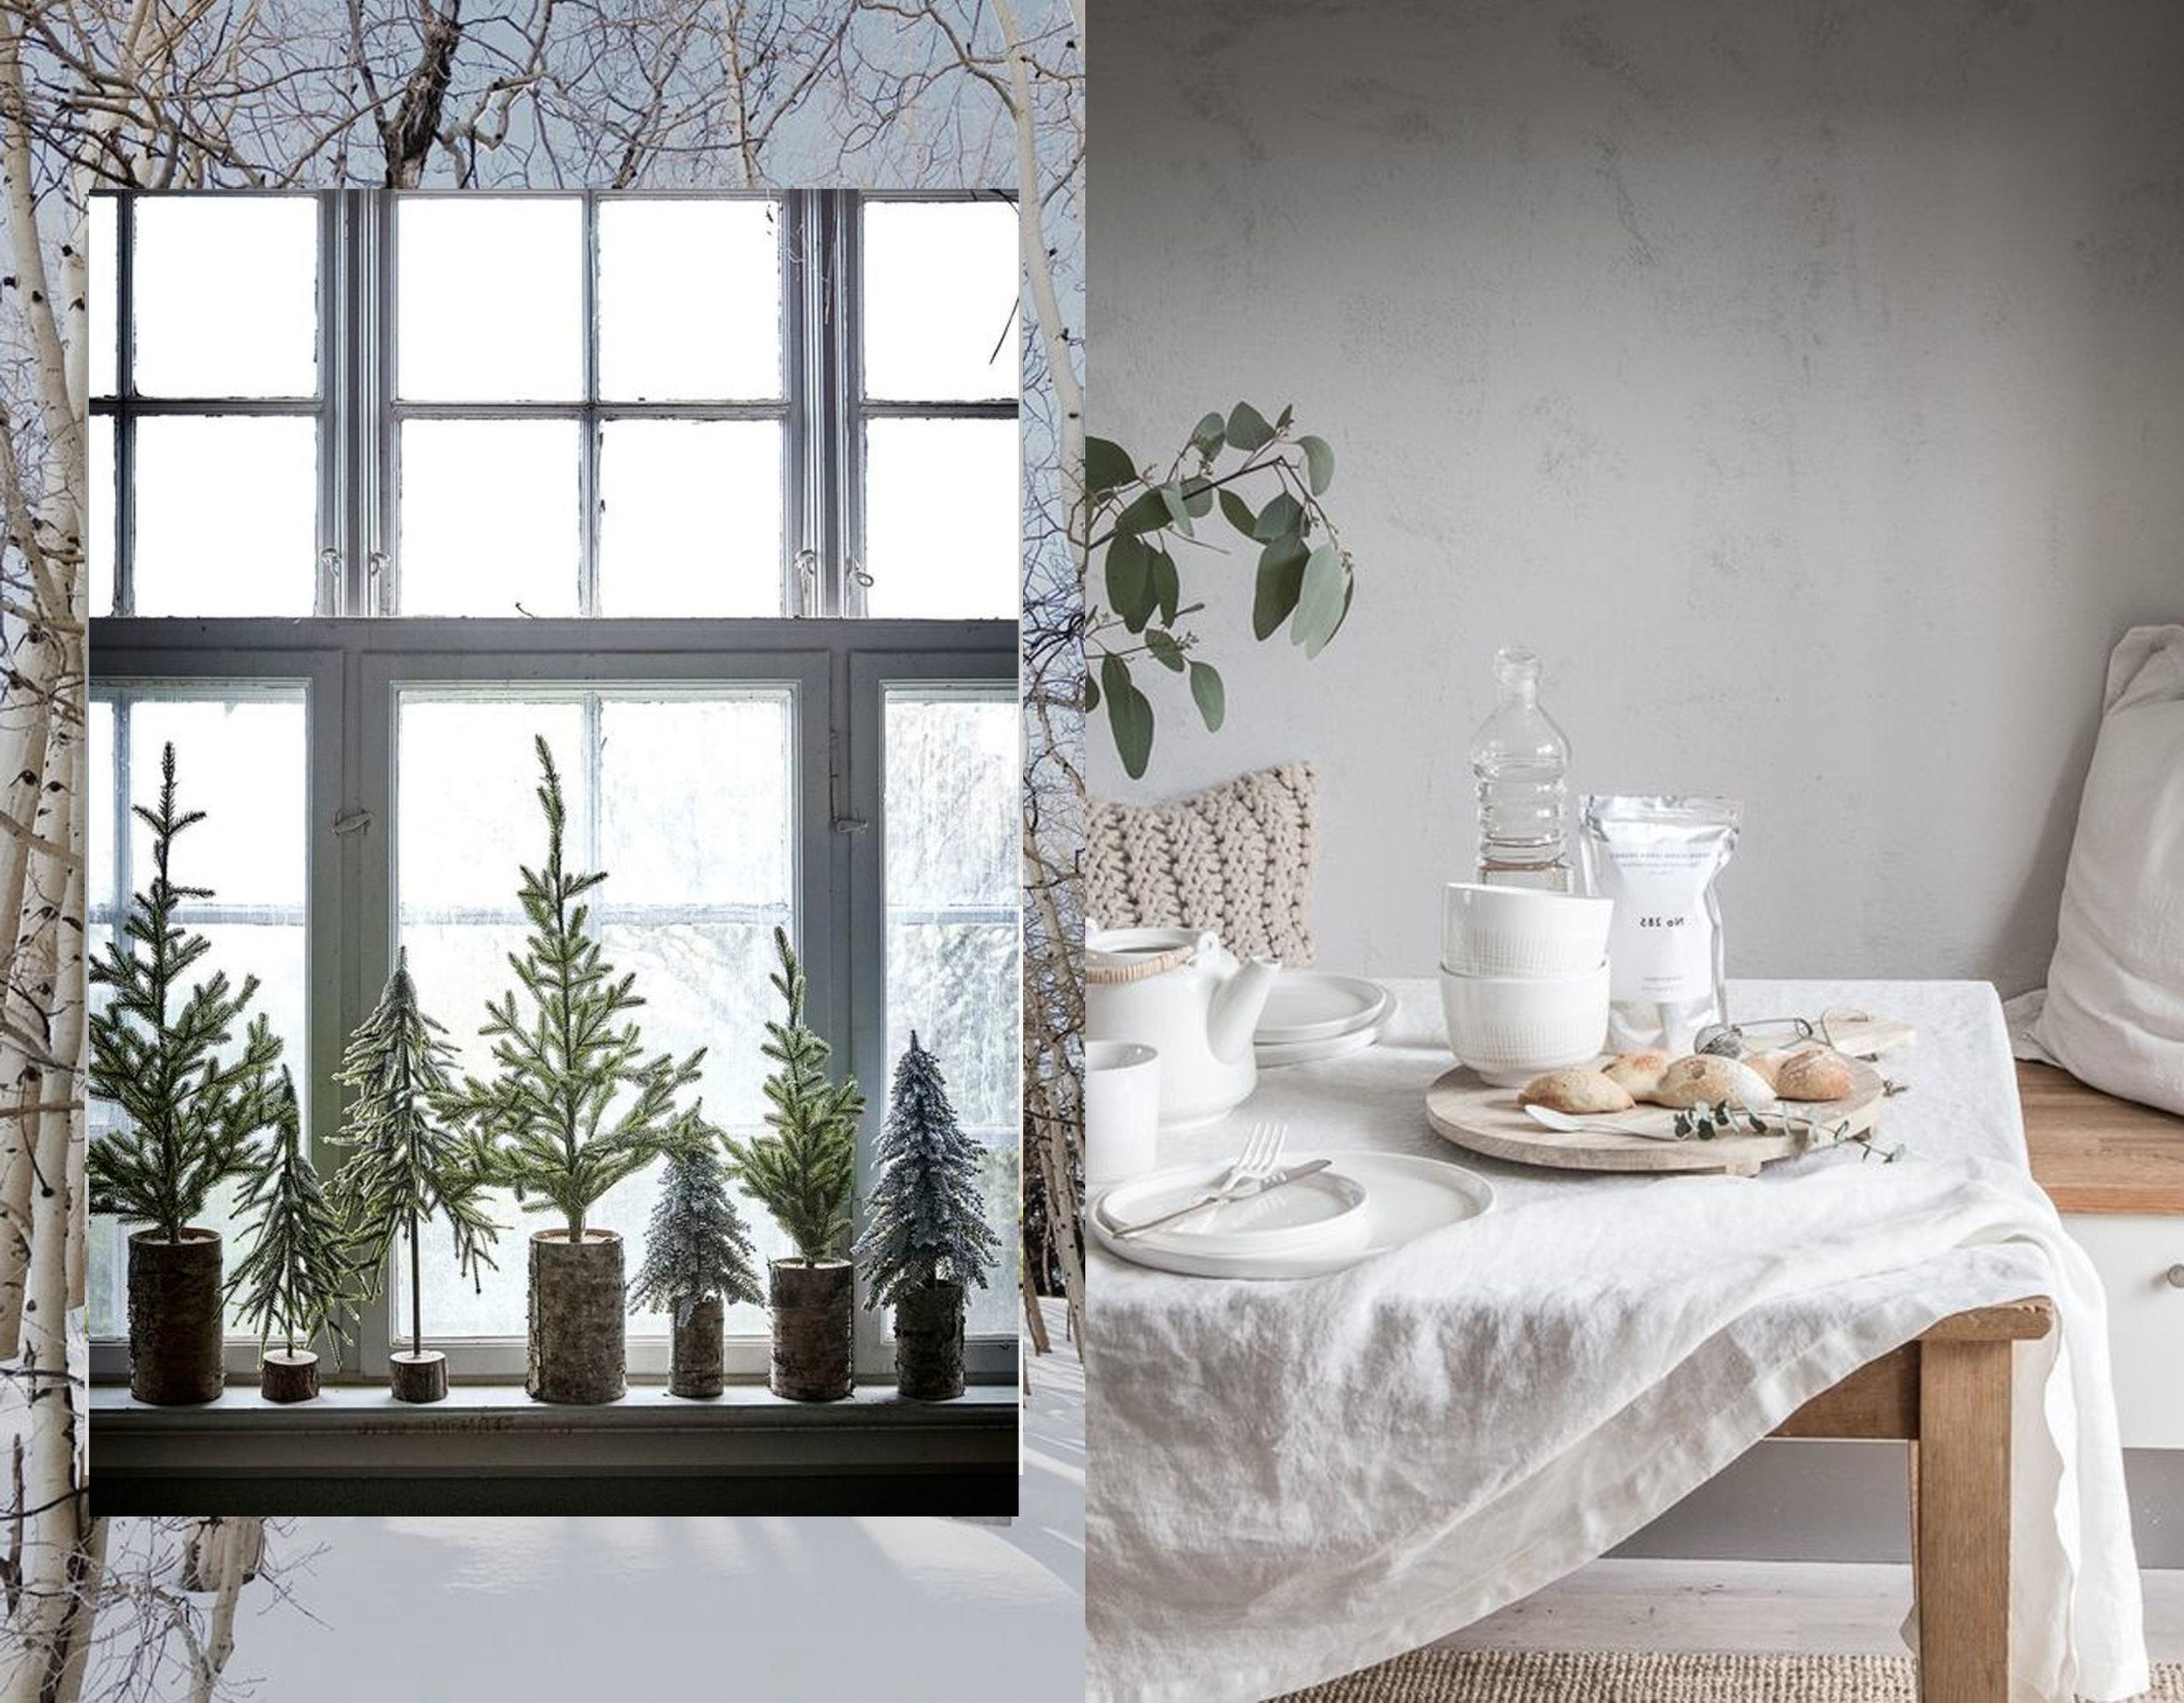 simple trees  House Doctor  - breakfast table  My Scandinavian Home